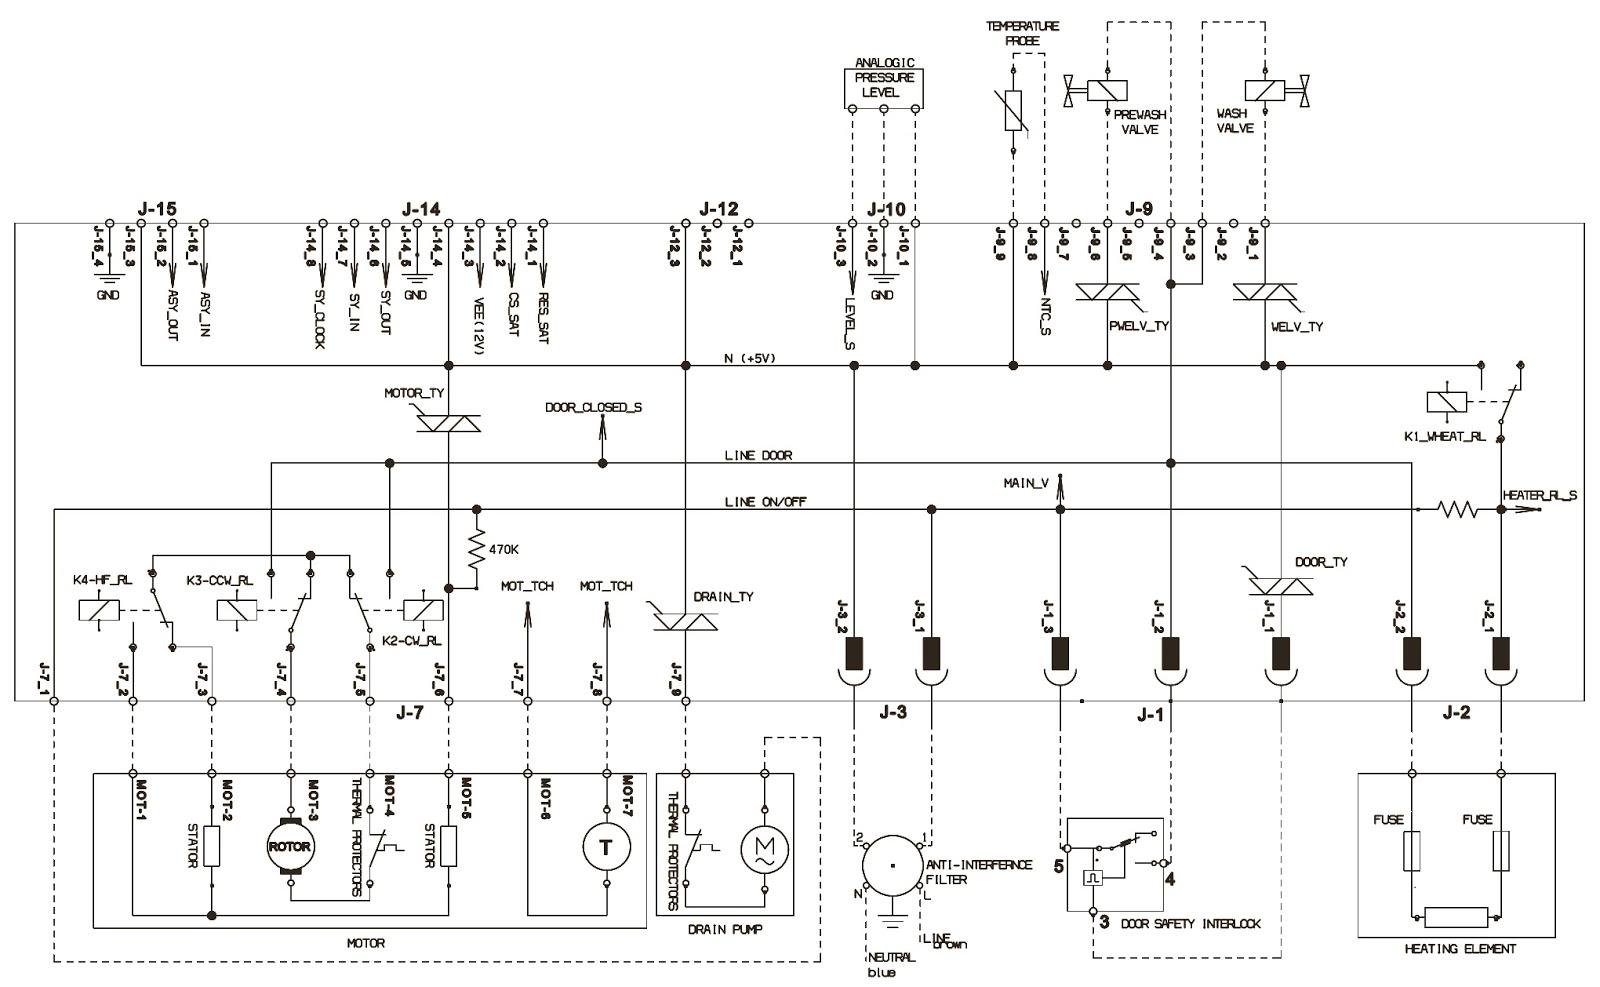 ELECTROLUX EWM1100 – TOP LOADER WASHING MACHNINE – WIRING DIAGRAM